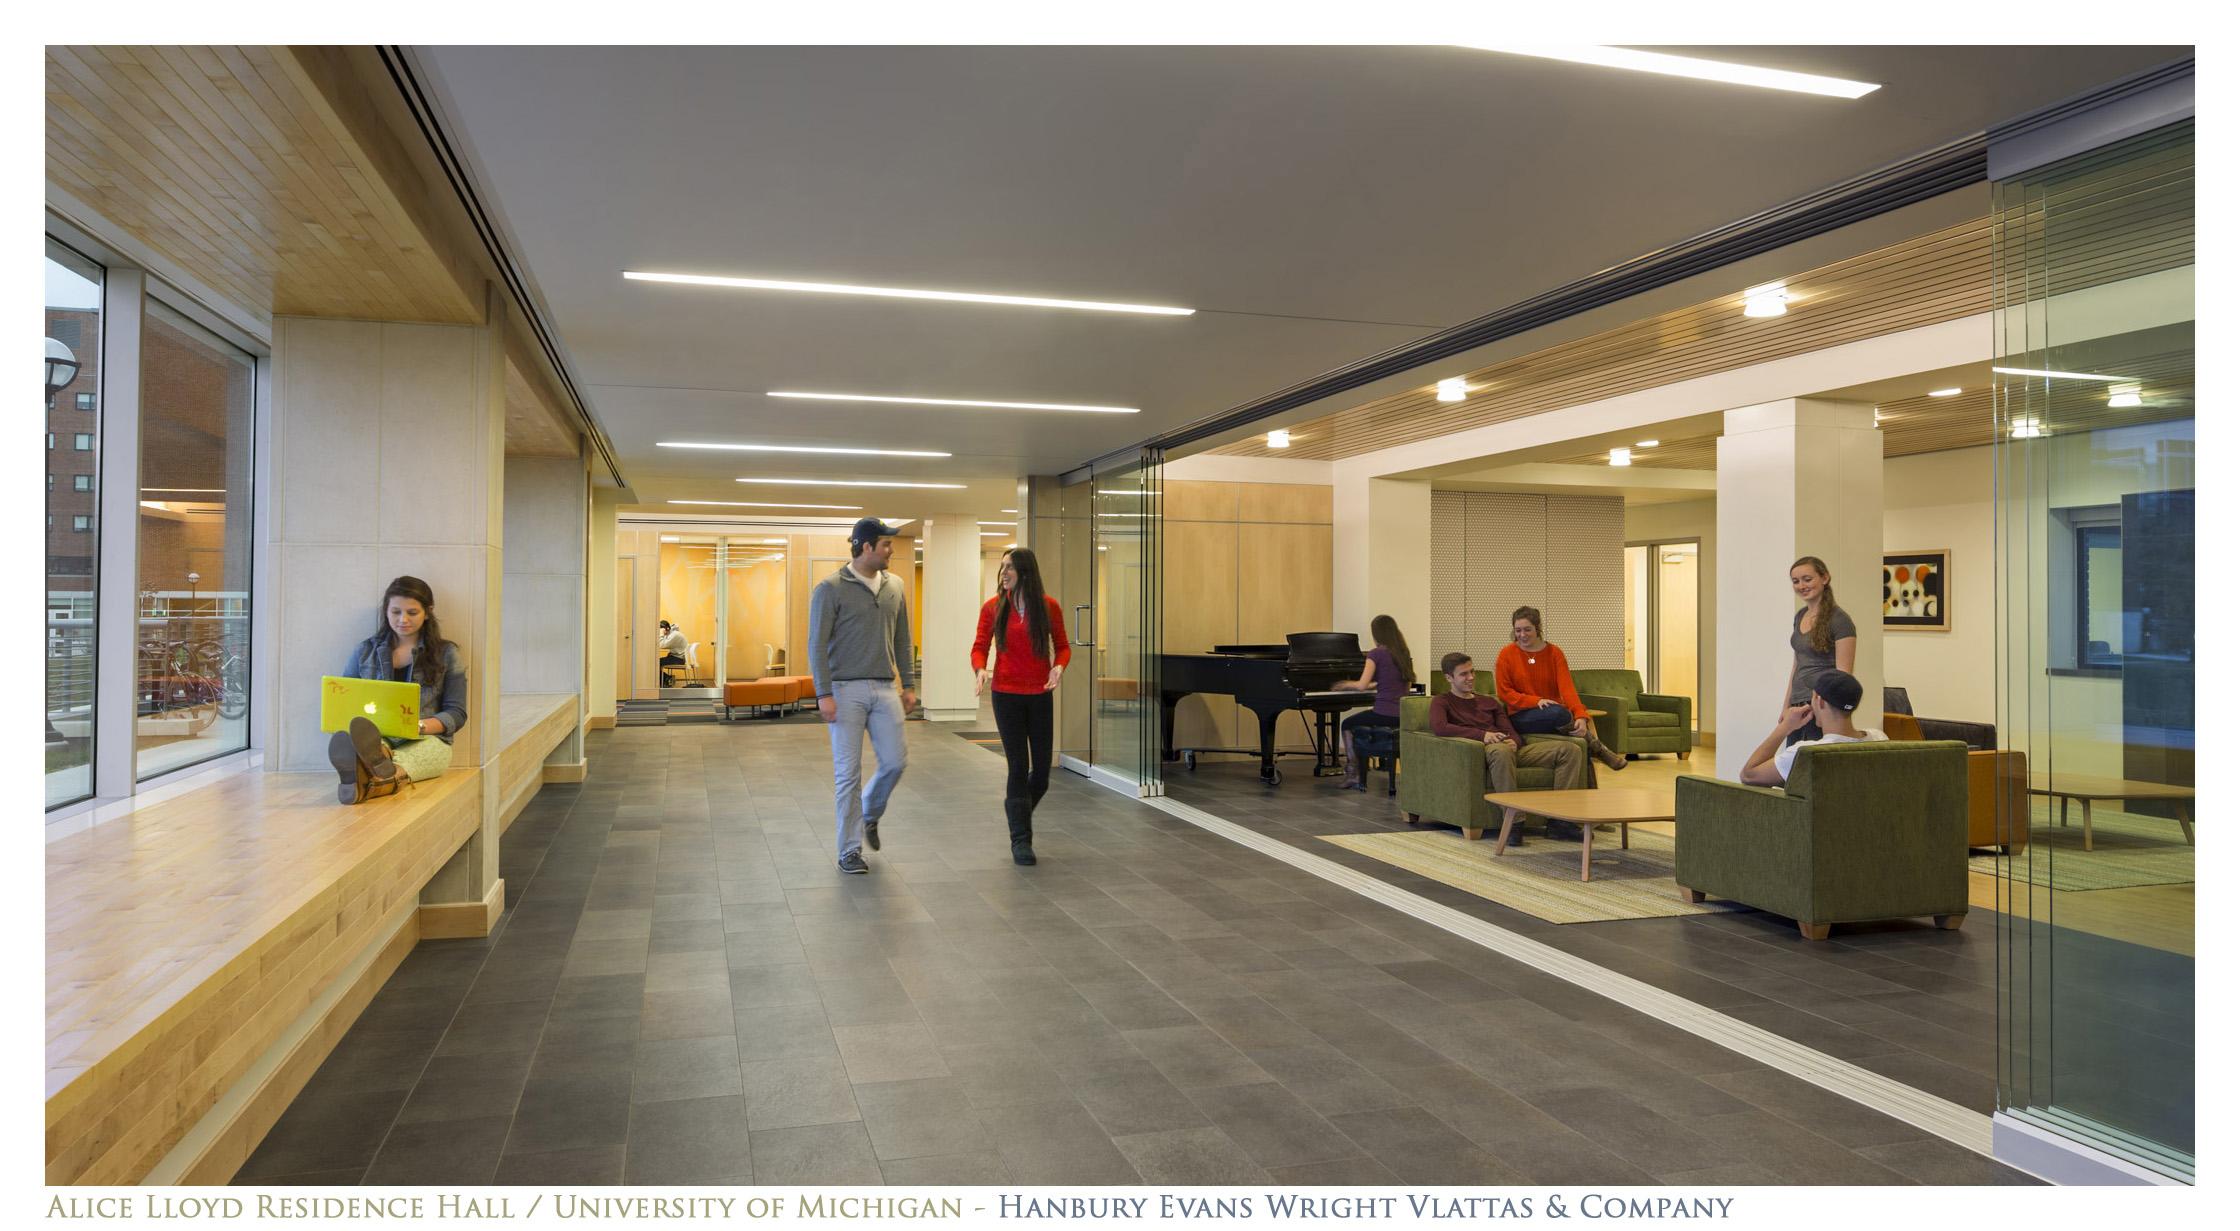 032_Robert-Benson-Photography-Hanbury-Evans-Wright-Vlattas-University-Michigan-Residence-Hall-46a.JPG